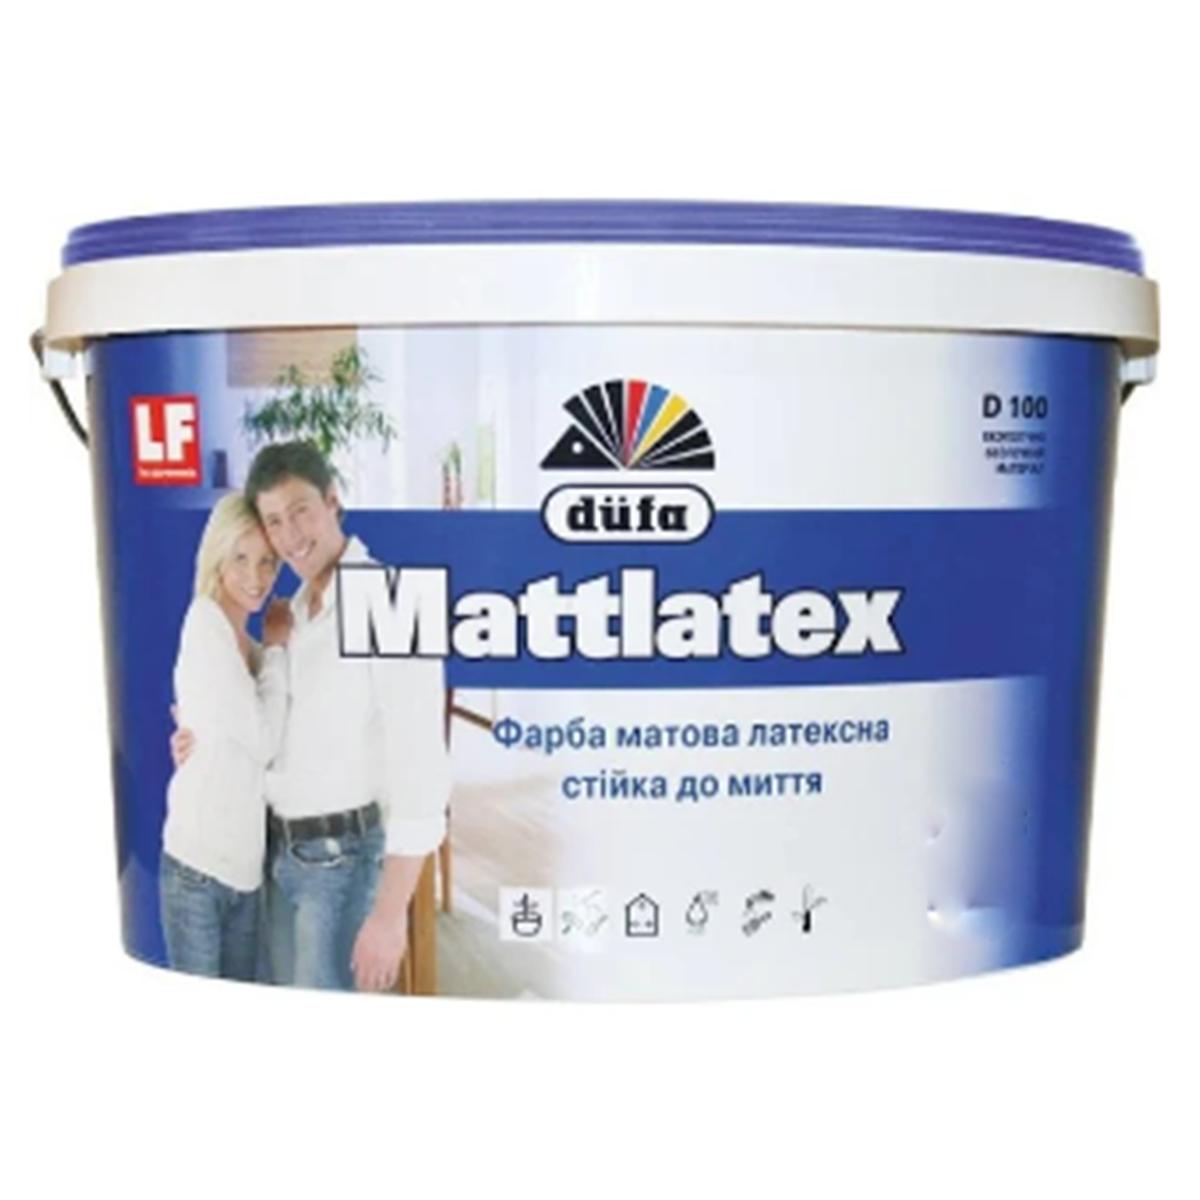 Интерьерная краска Dufa Mattlatex D100 матовая 5л